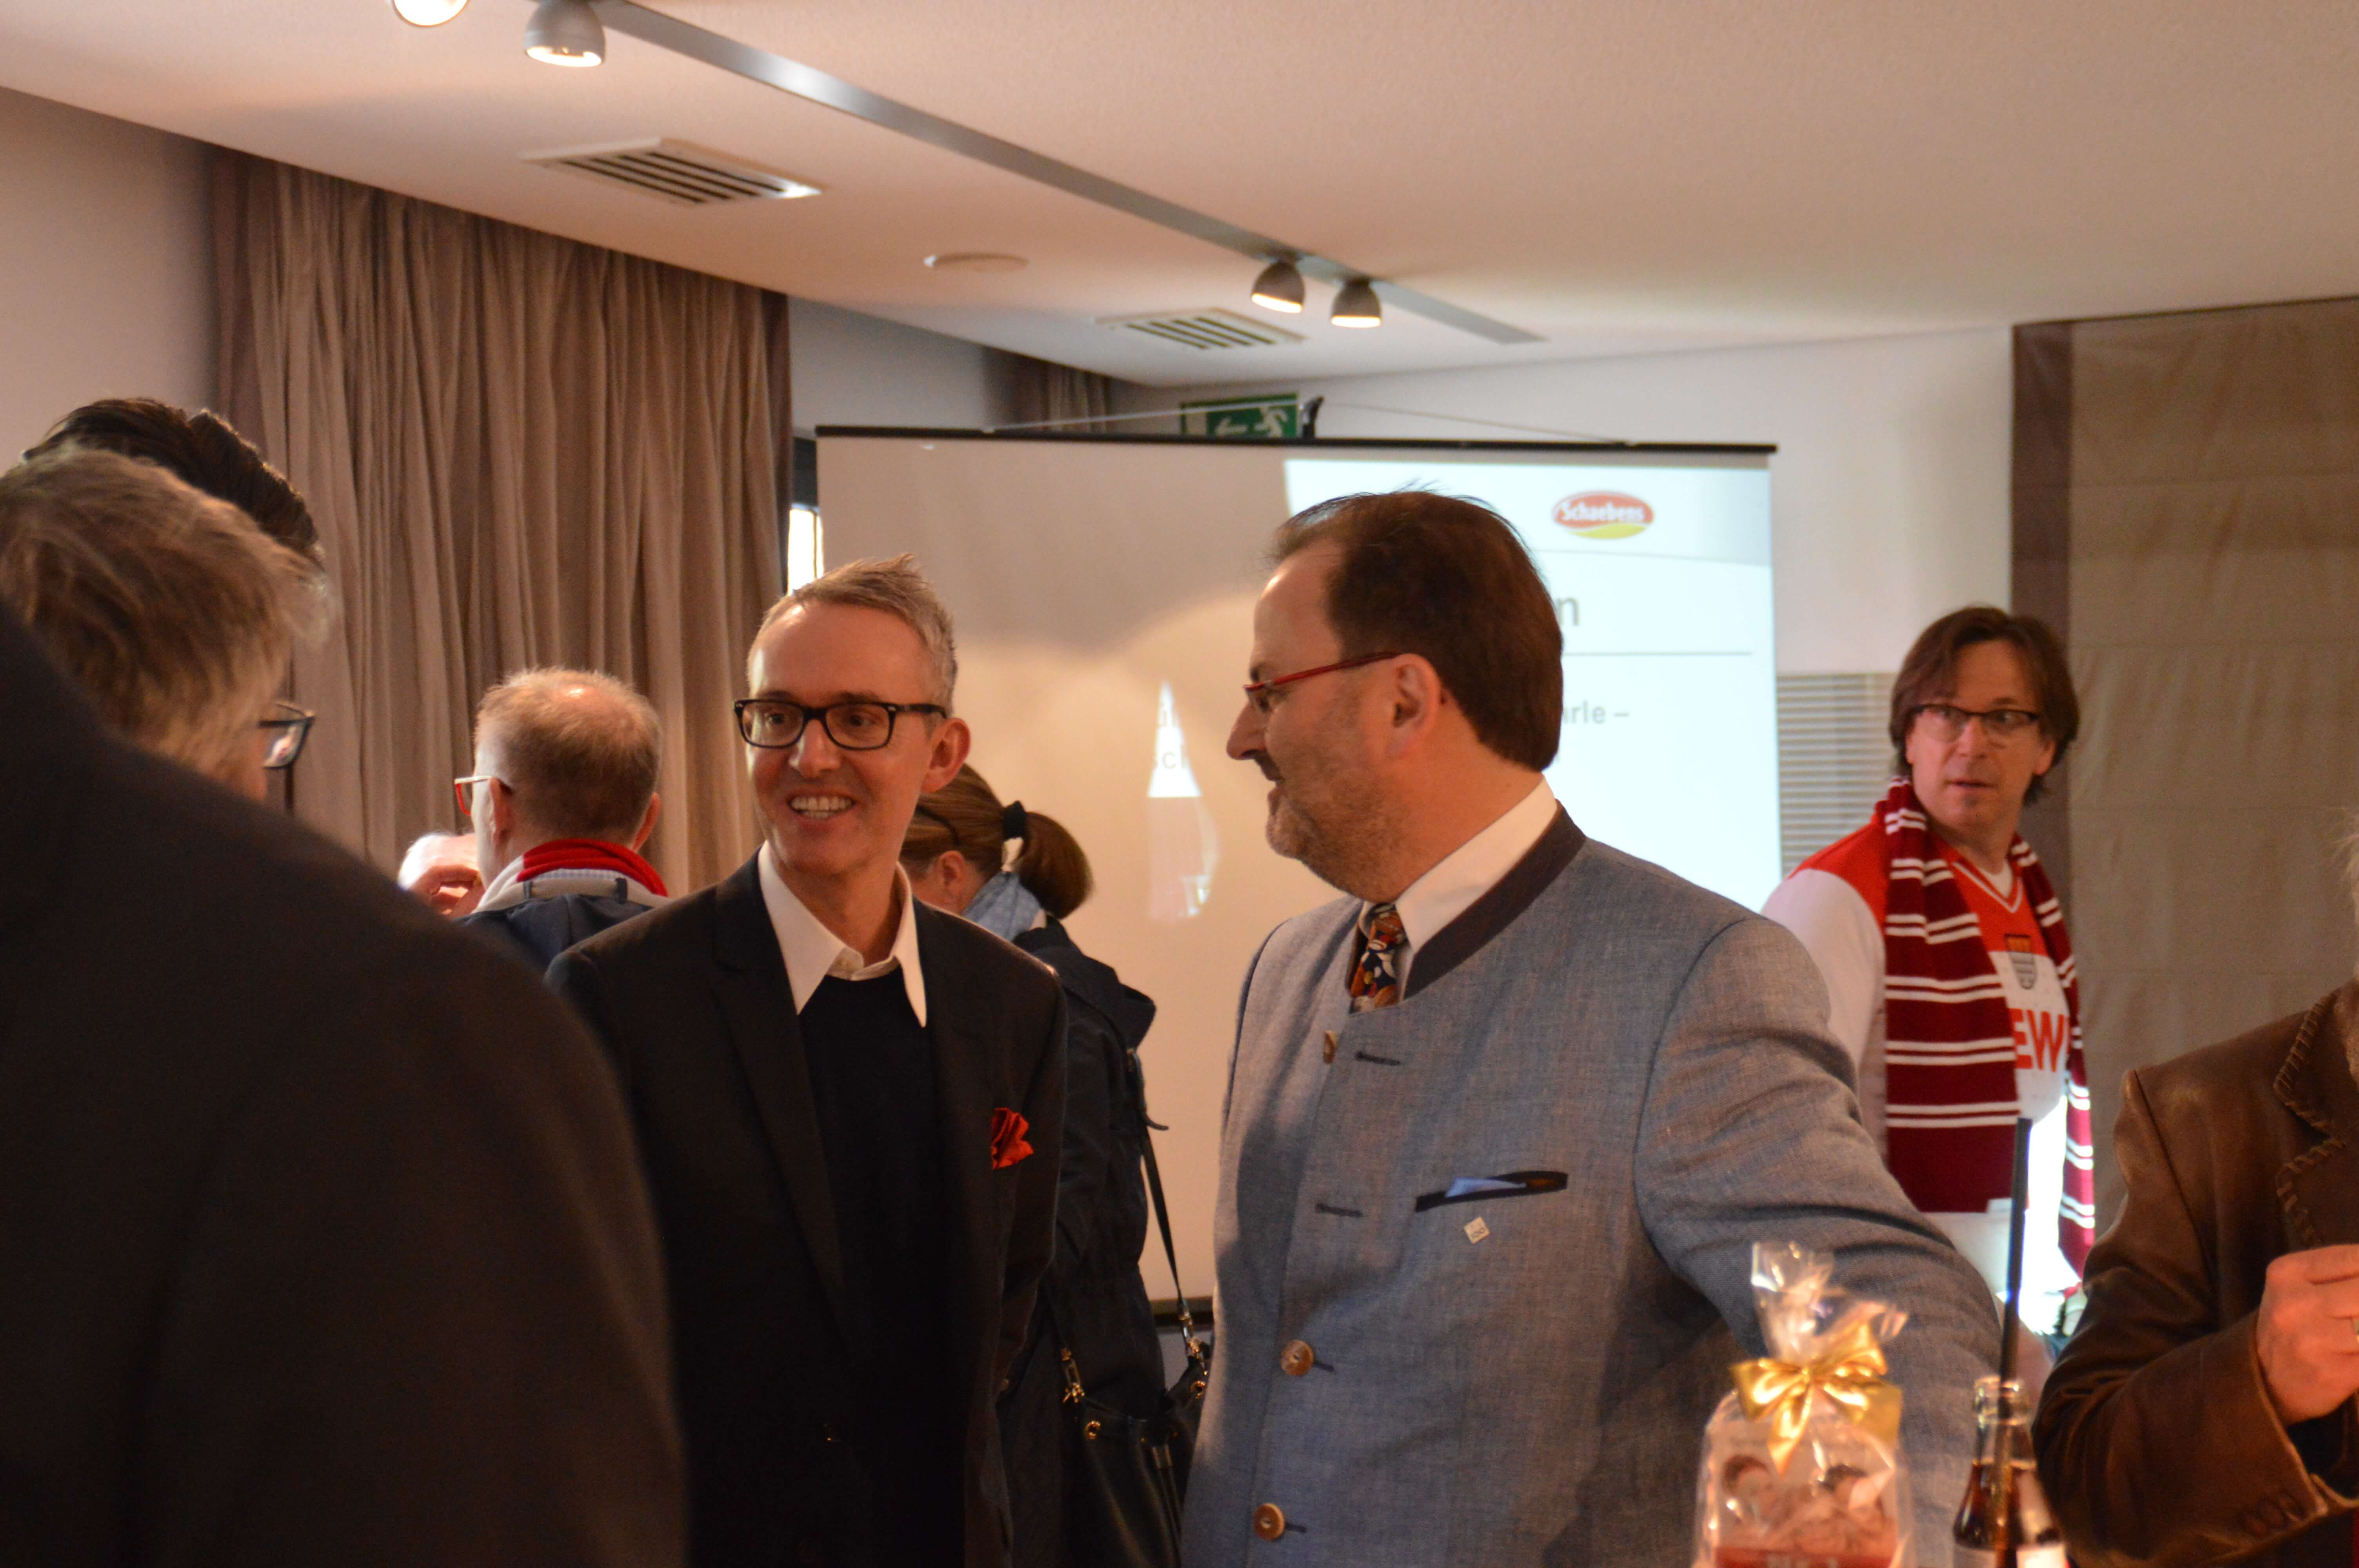 fc-schaebens-sponsoring-partner des tages-club astoria-frauenfußball